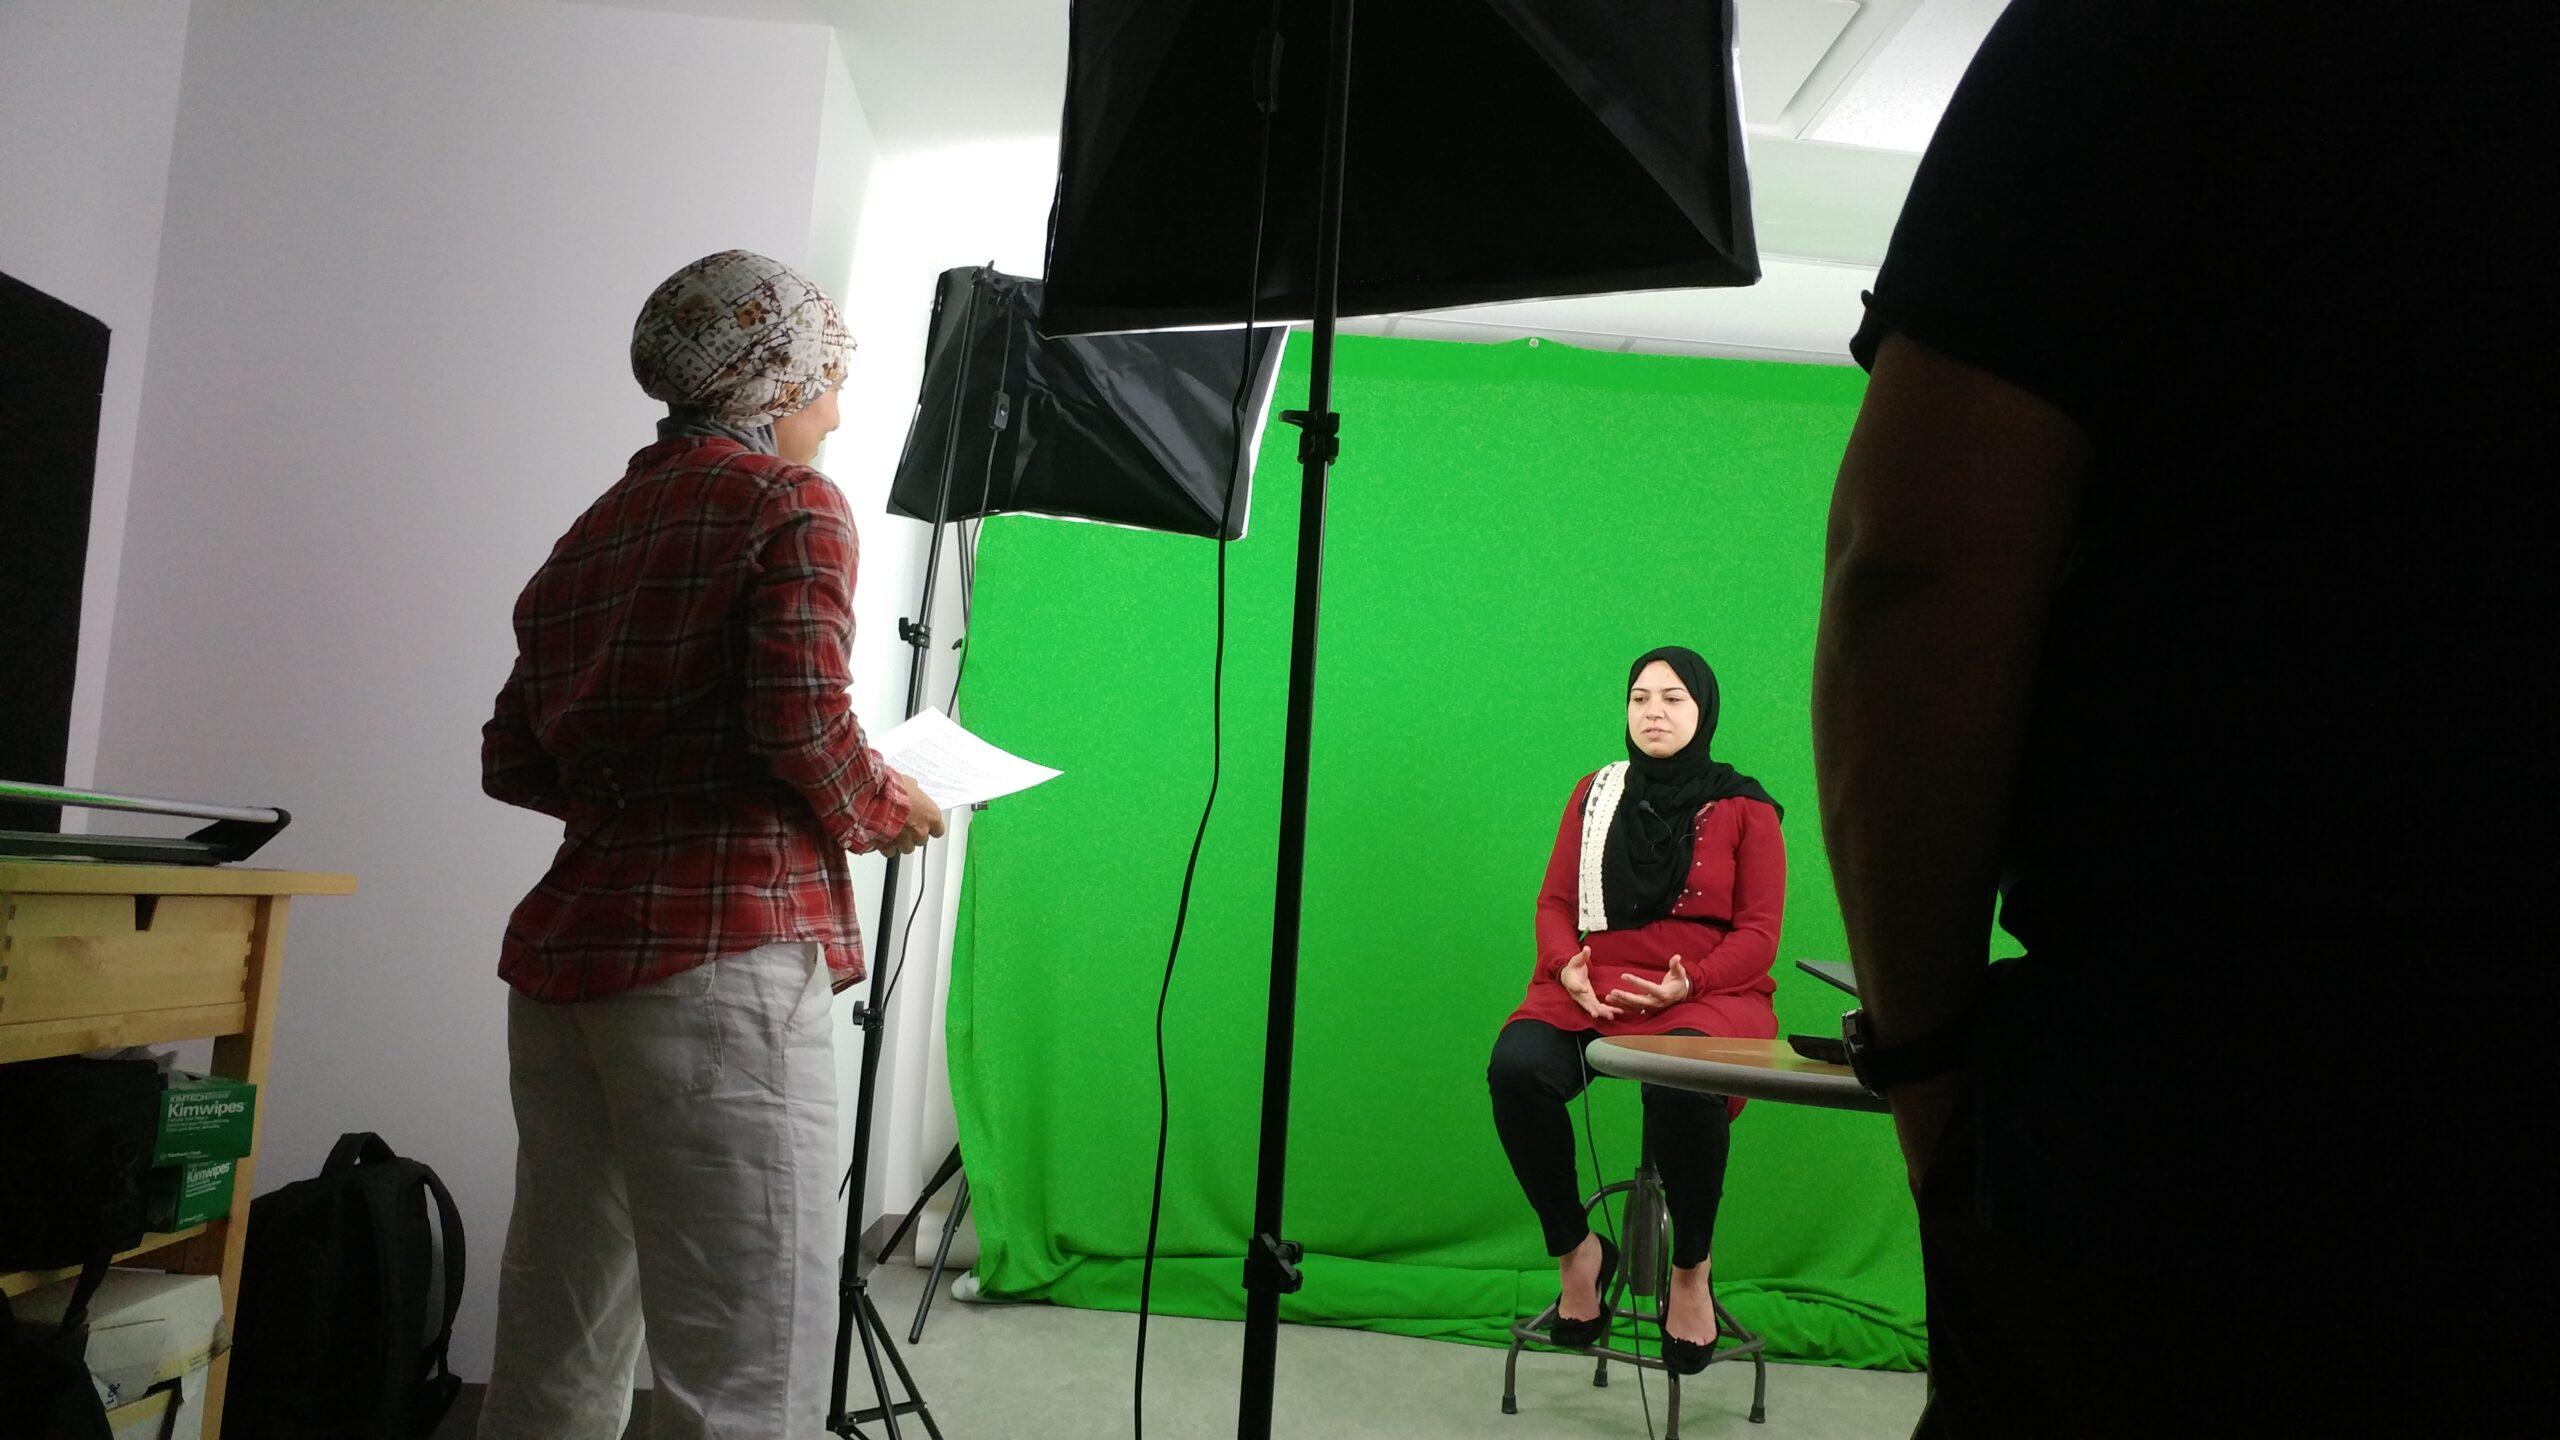 Nadia Abu-Zahra interviews Mozaynah Nofal in the studio at uOttawa.